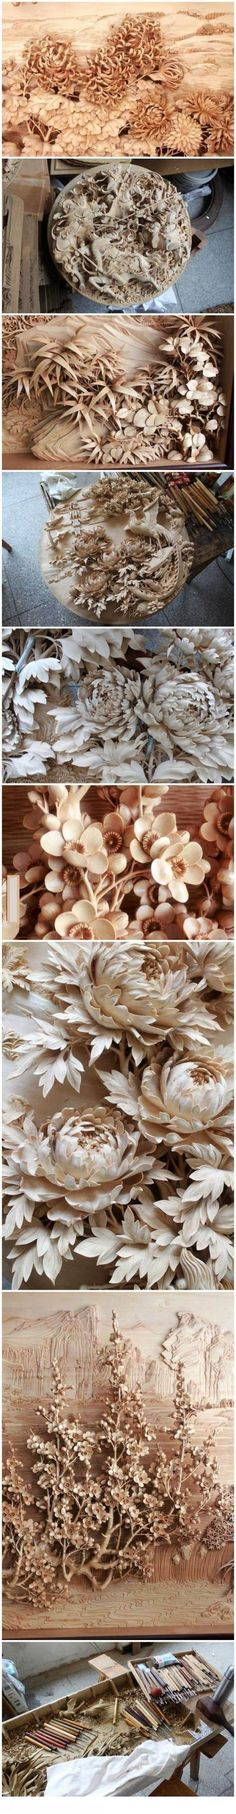 Amazing Chinese wood craft